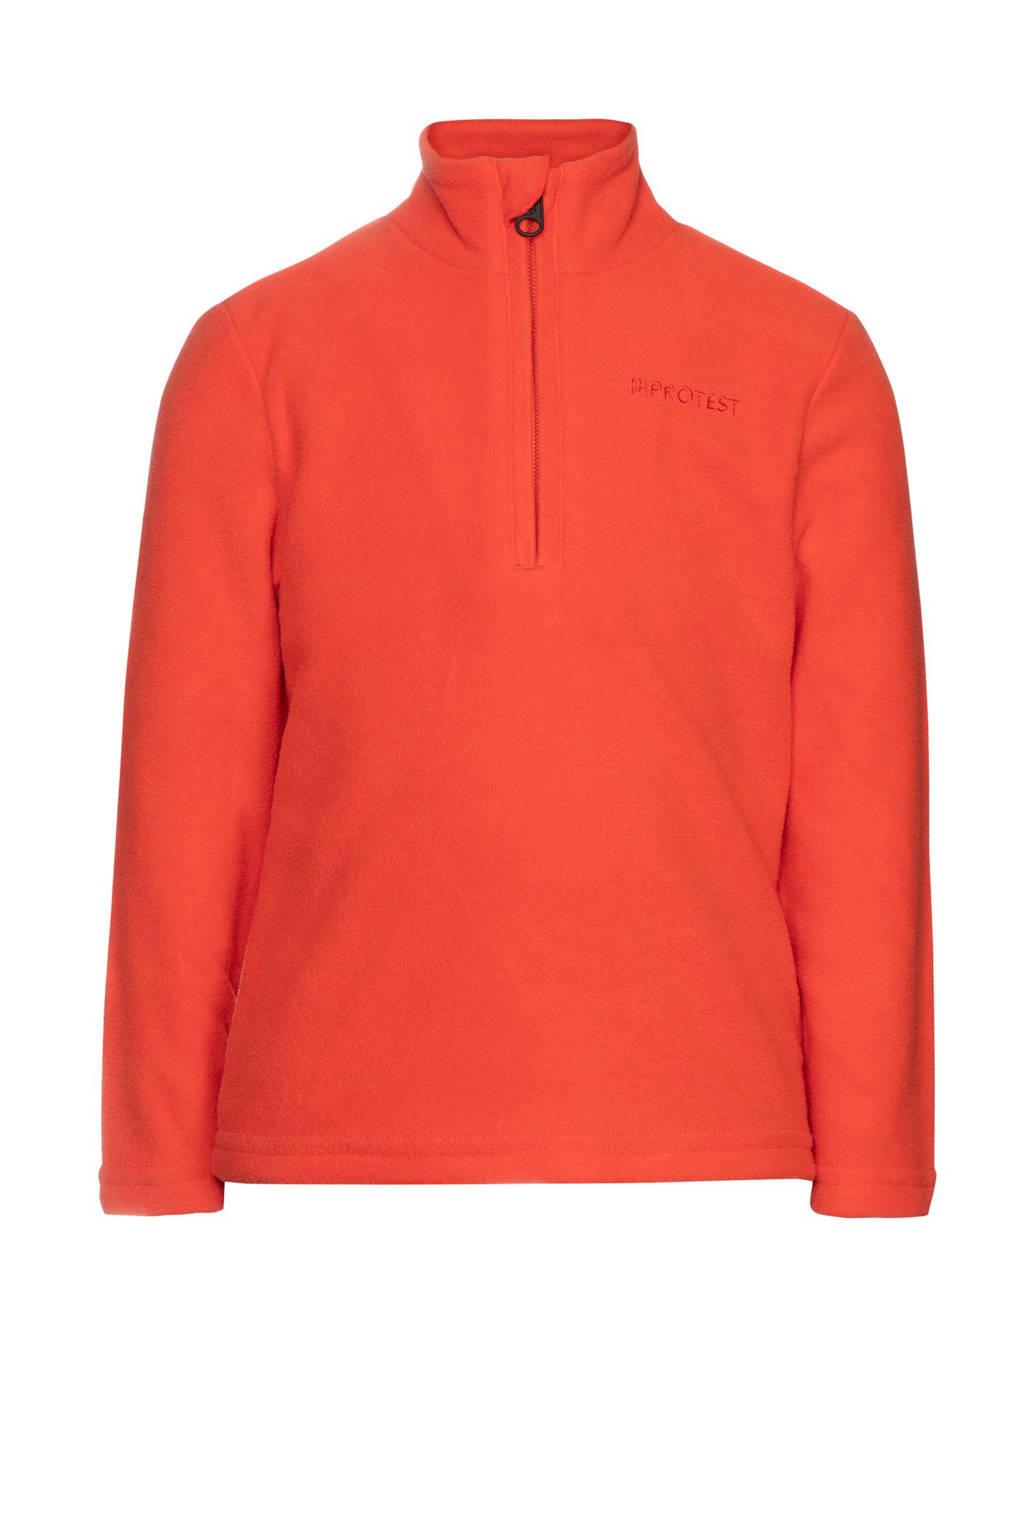 Protest skipully Perfect Oranje, Orange Fire